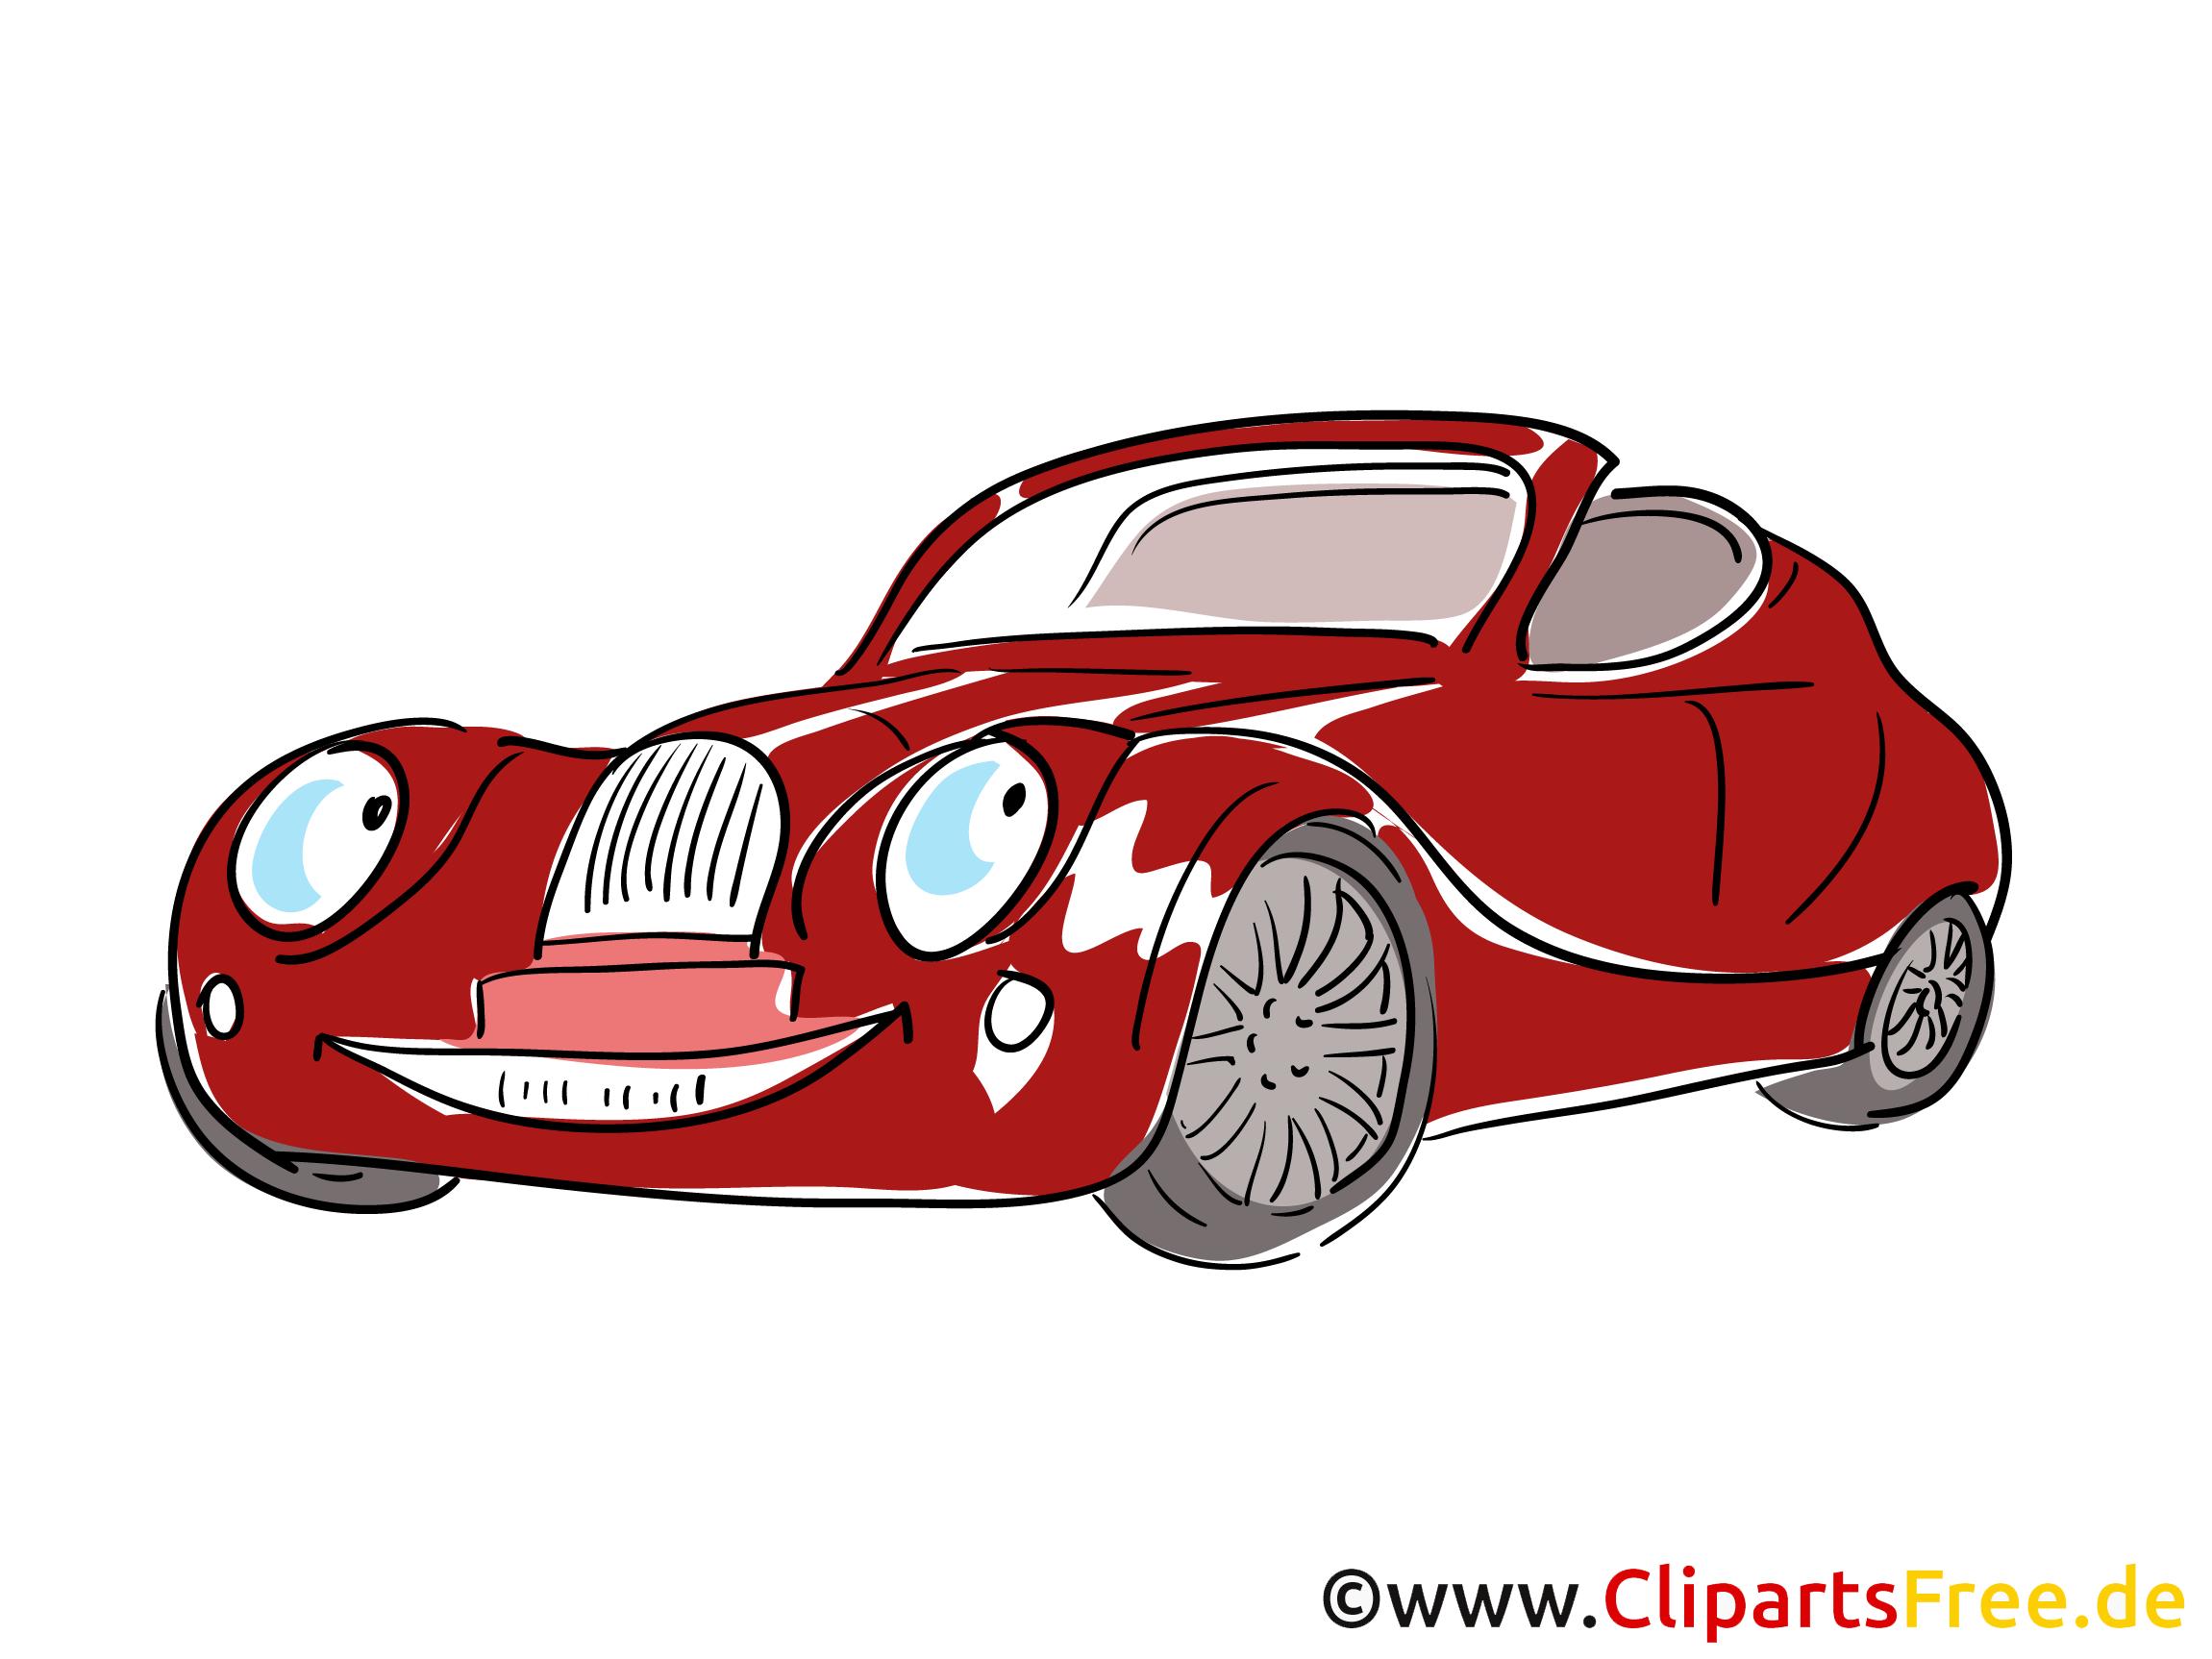 Cars clip art free